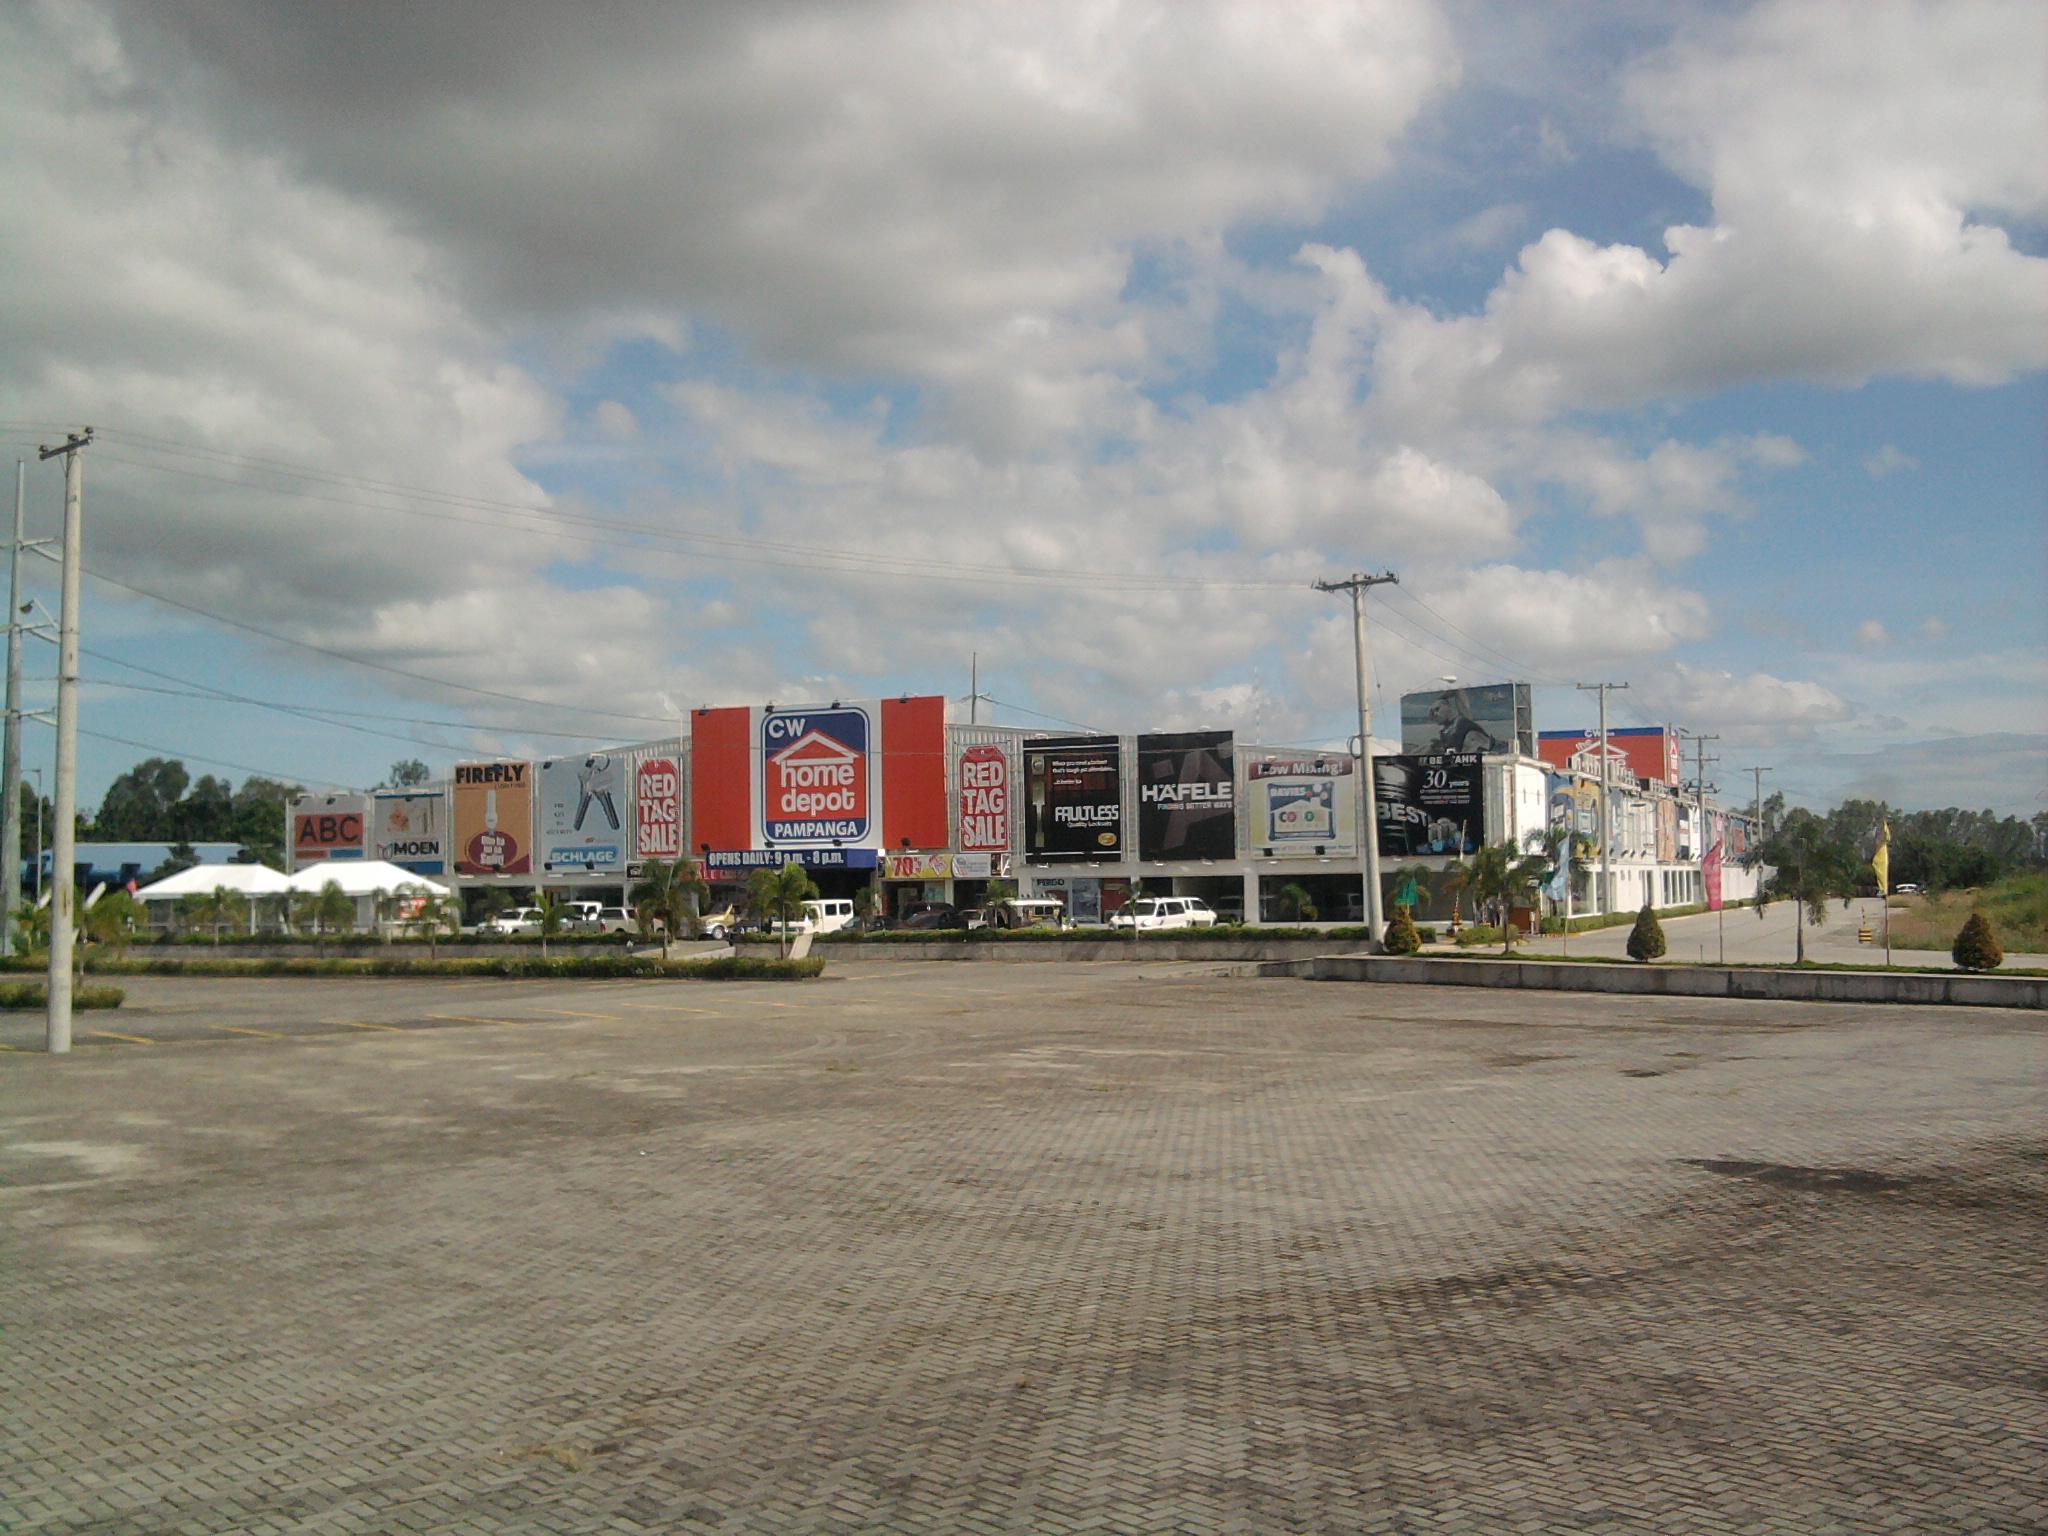 Home Depot San Fernando Pampanga